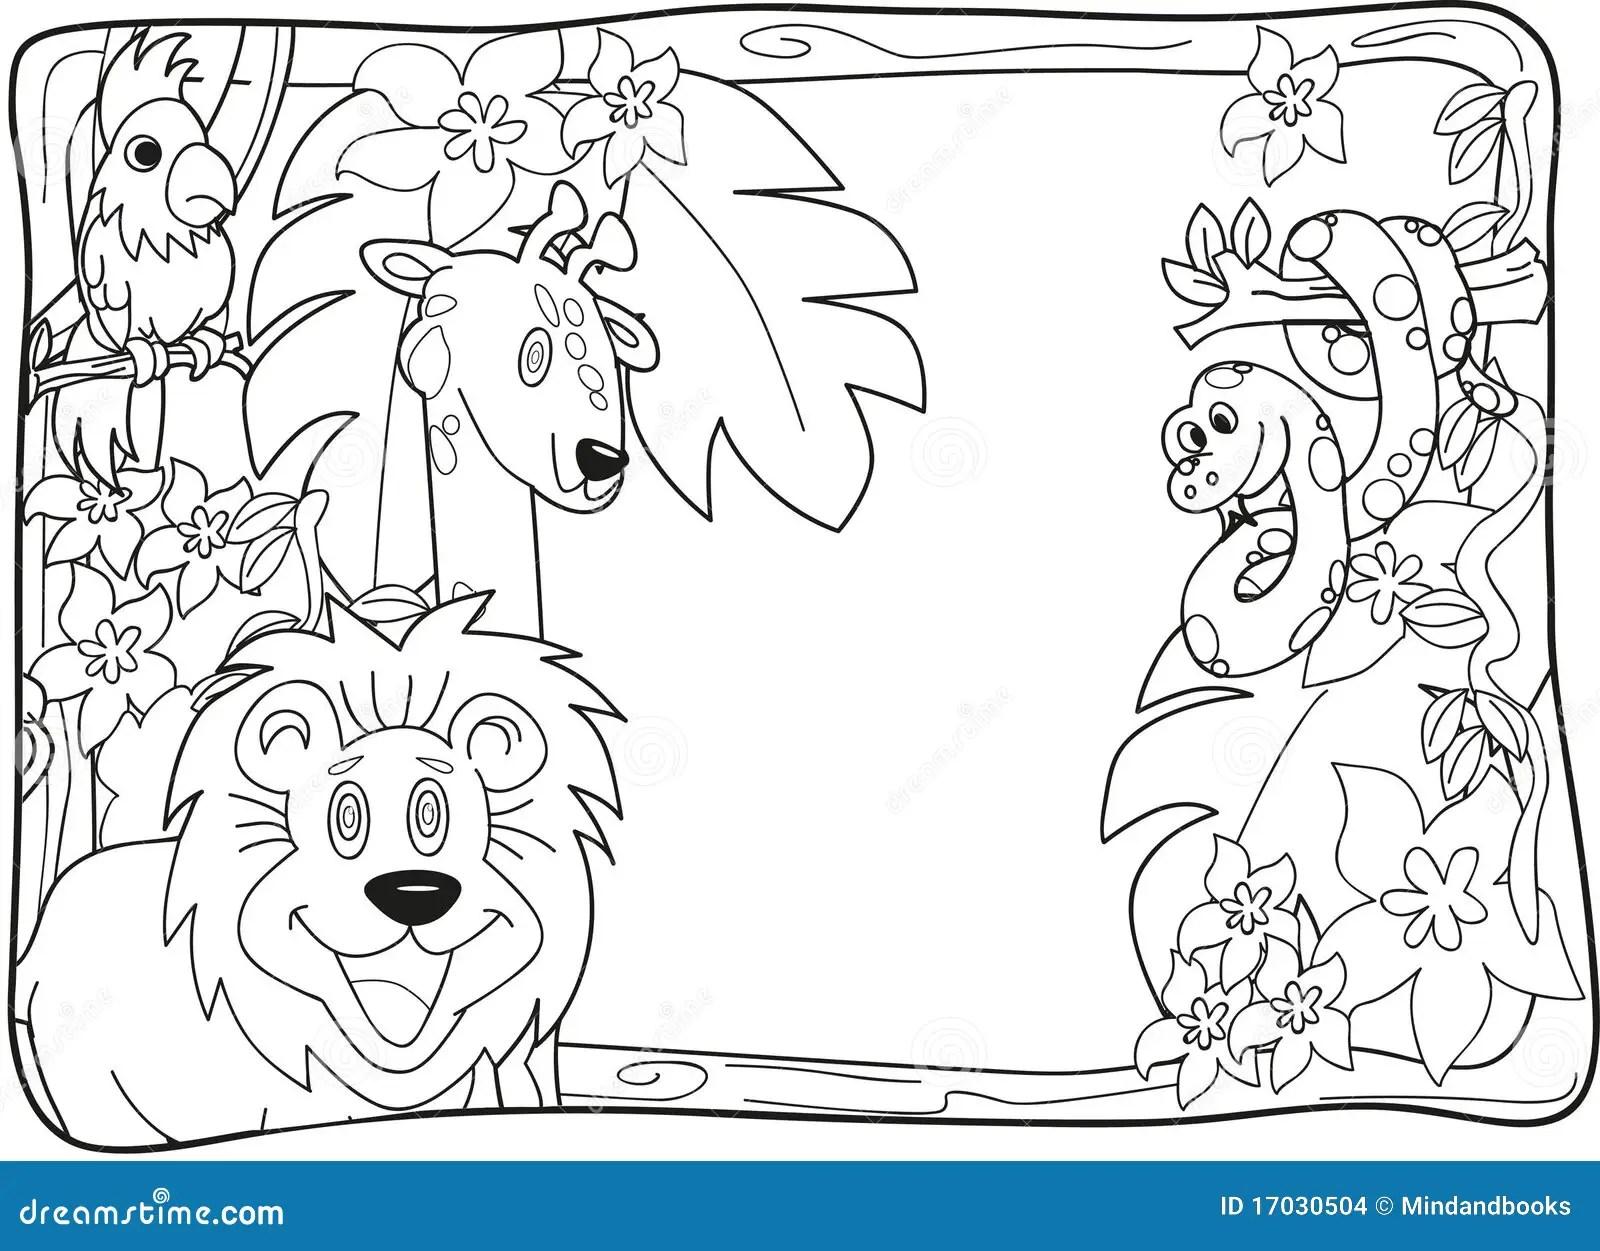 Invitacion Lineart De La Selva Stock De Ilustracion